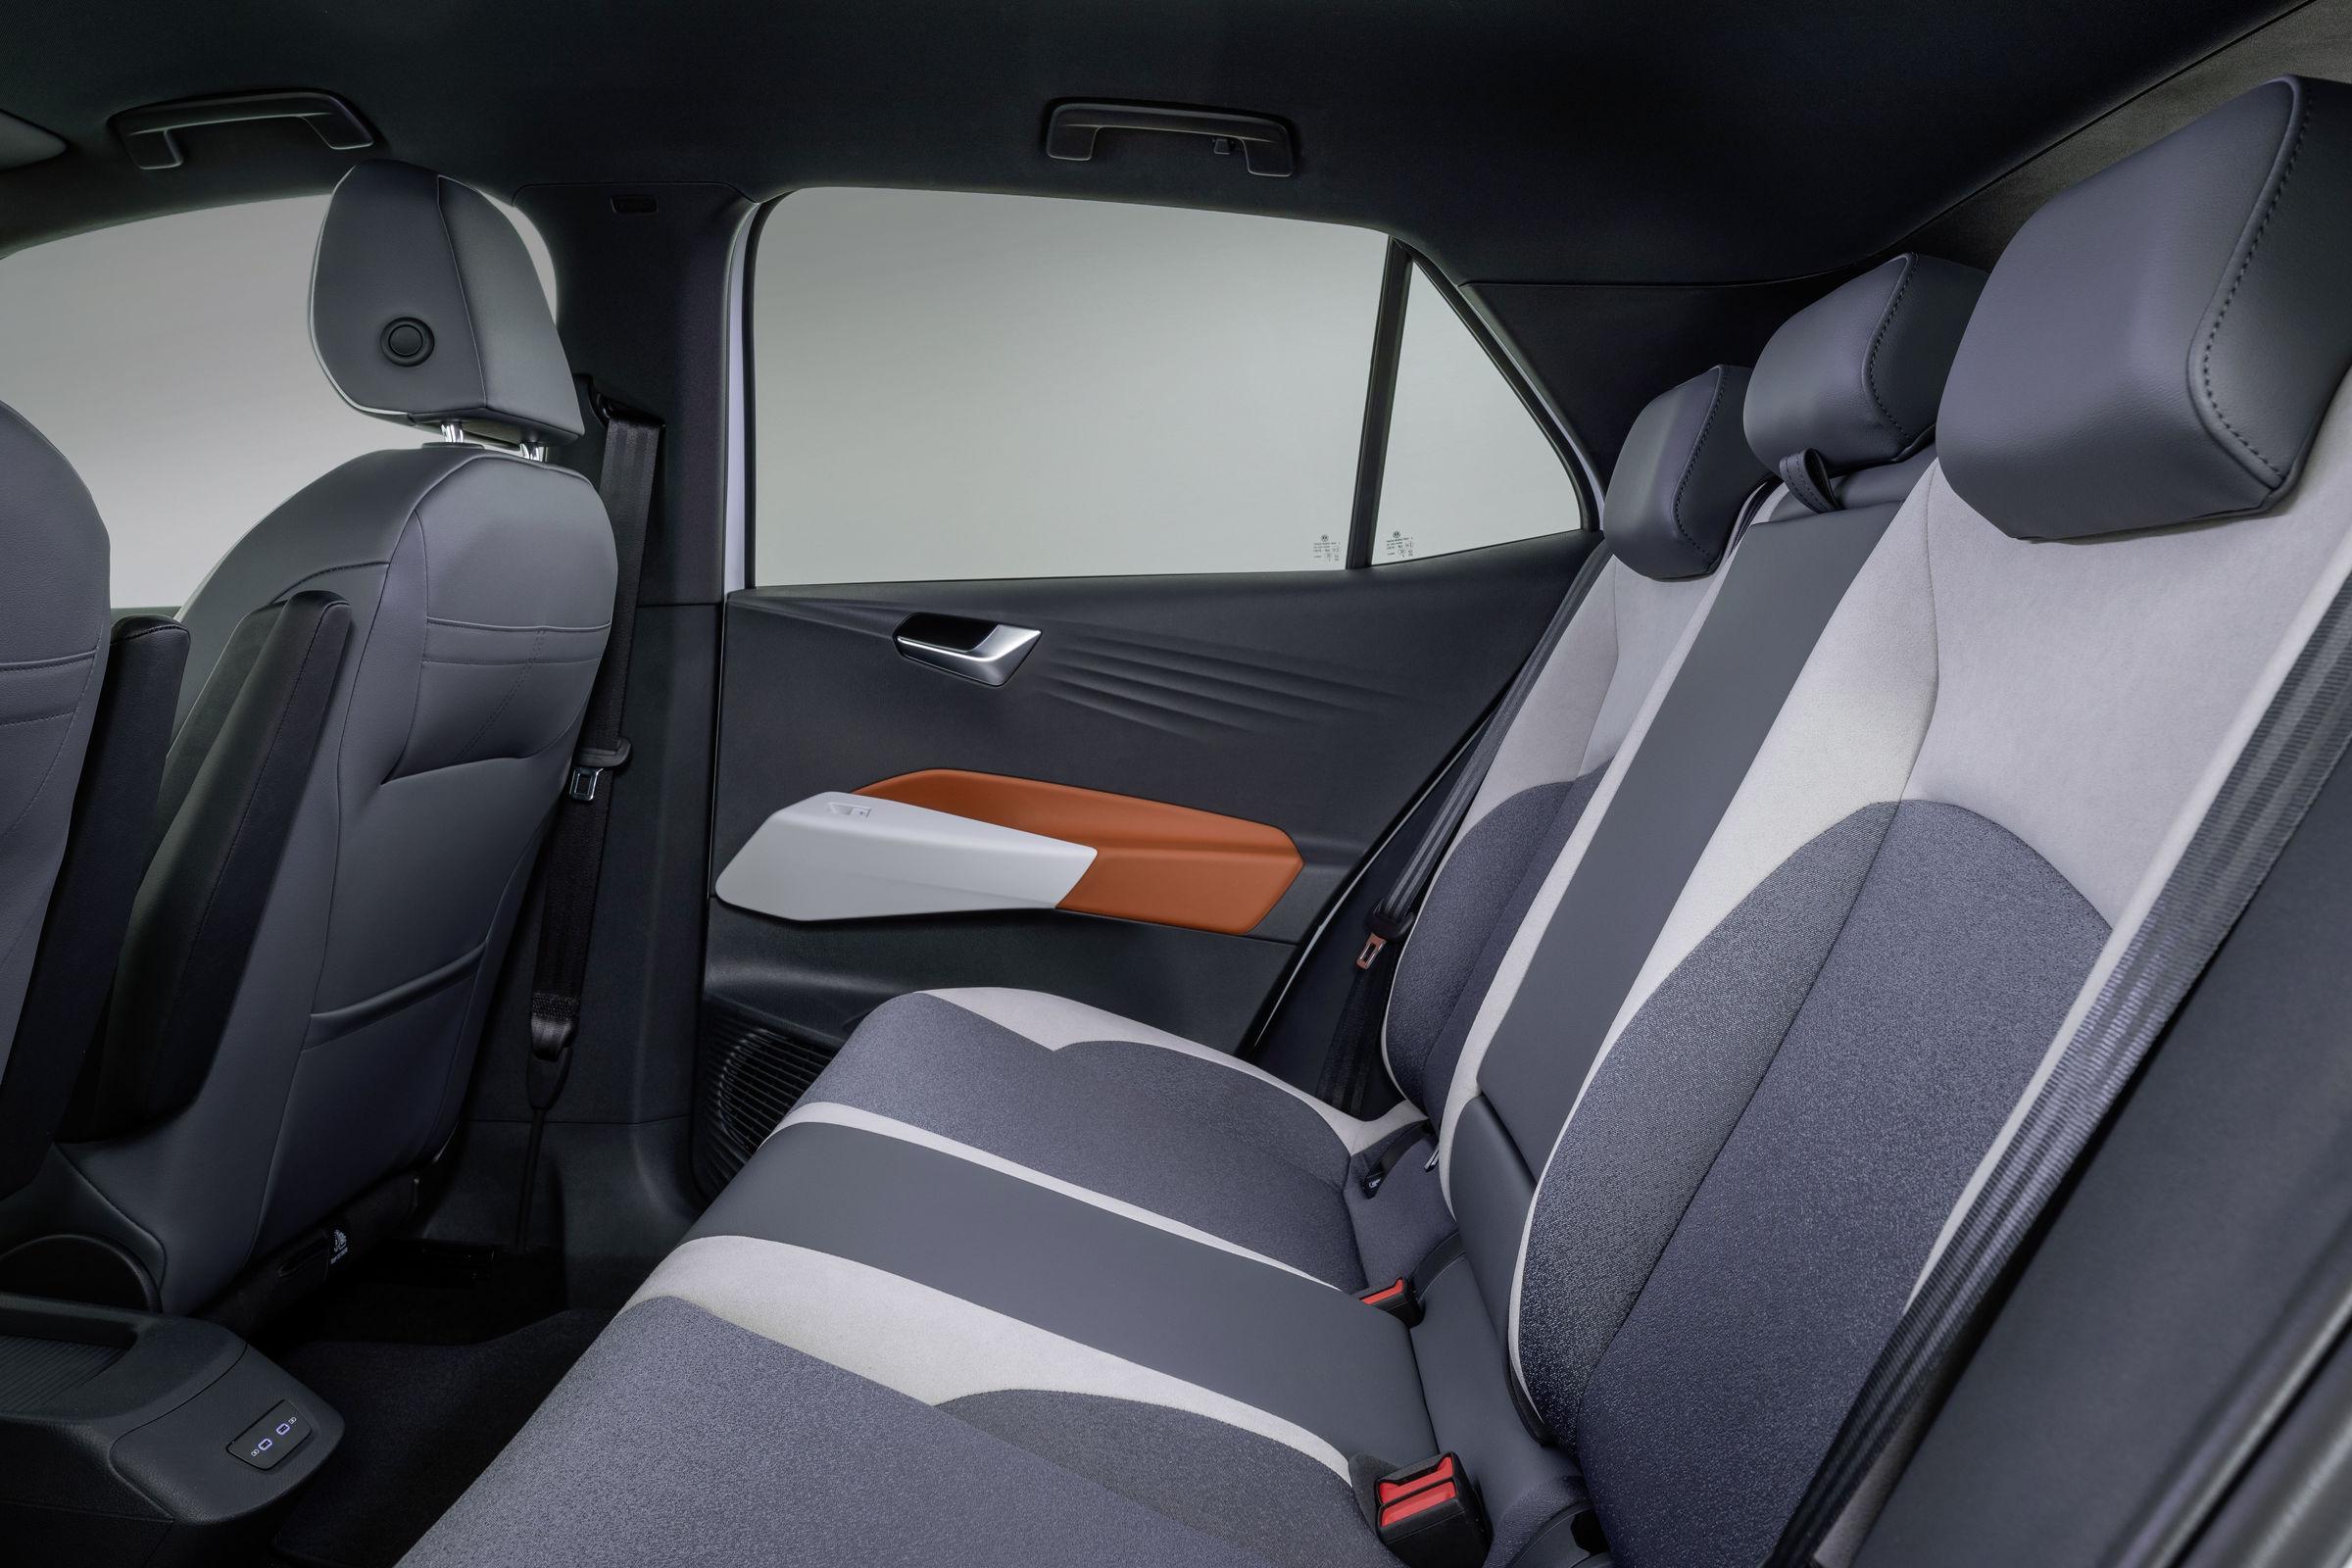 Roomy rear seating at a sleep-ready angle